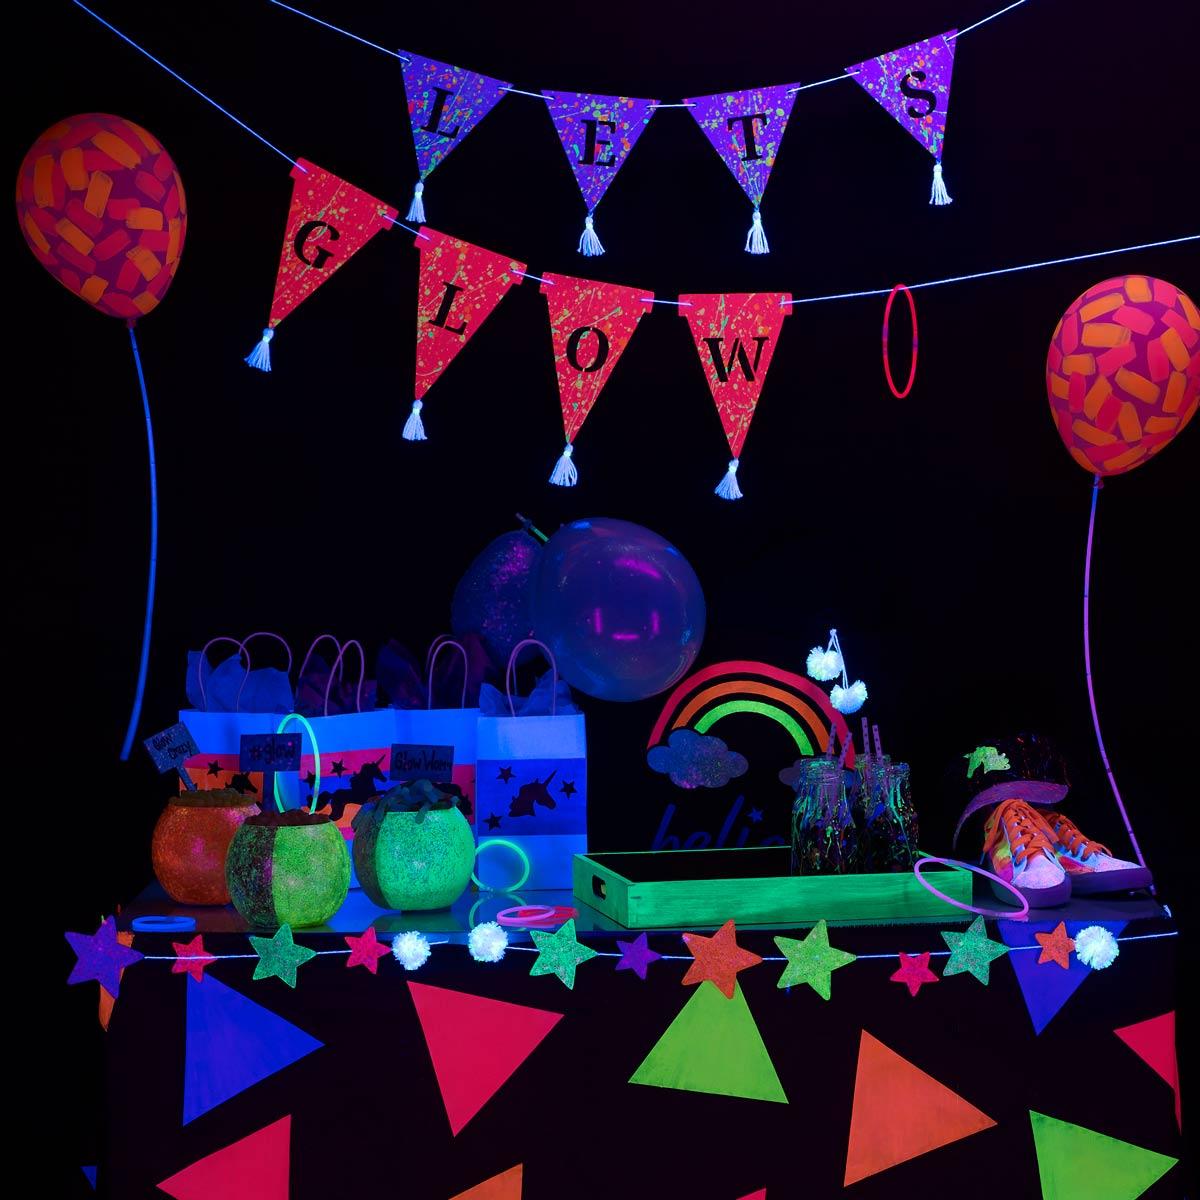 Glow-in-the-Dark Brushstroke Balloons